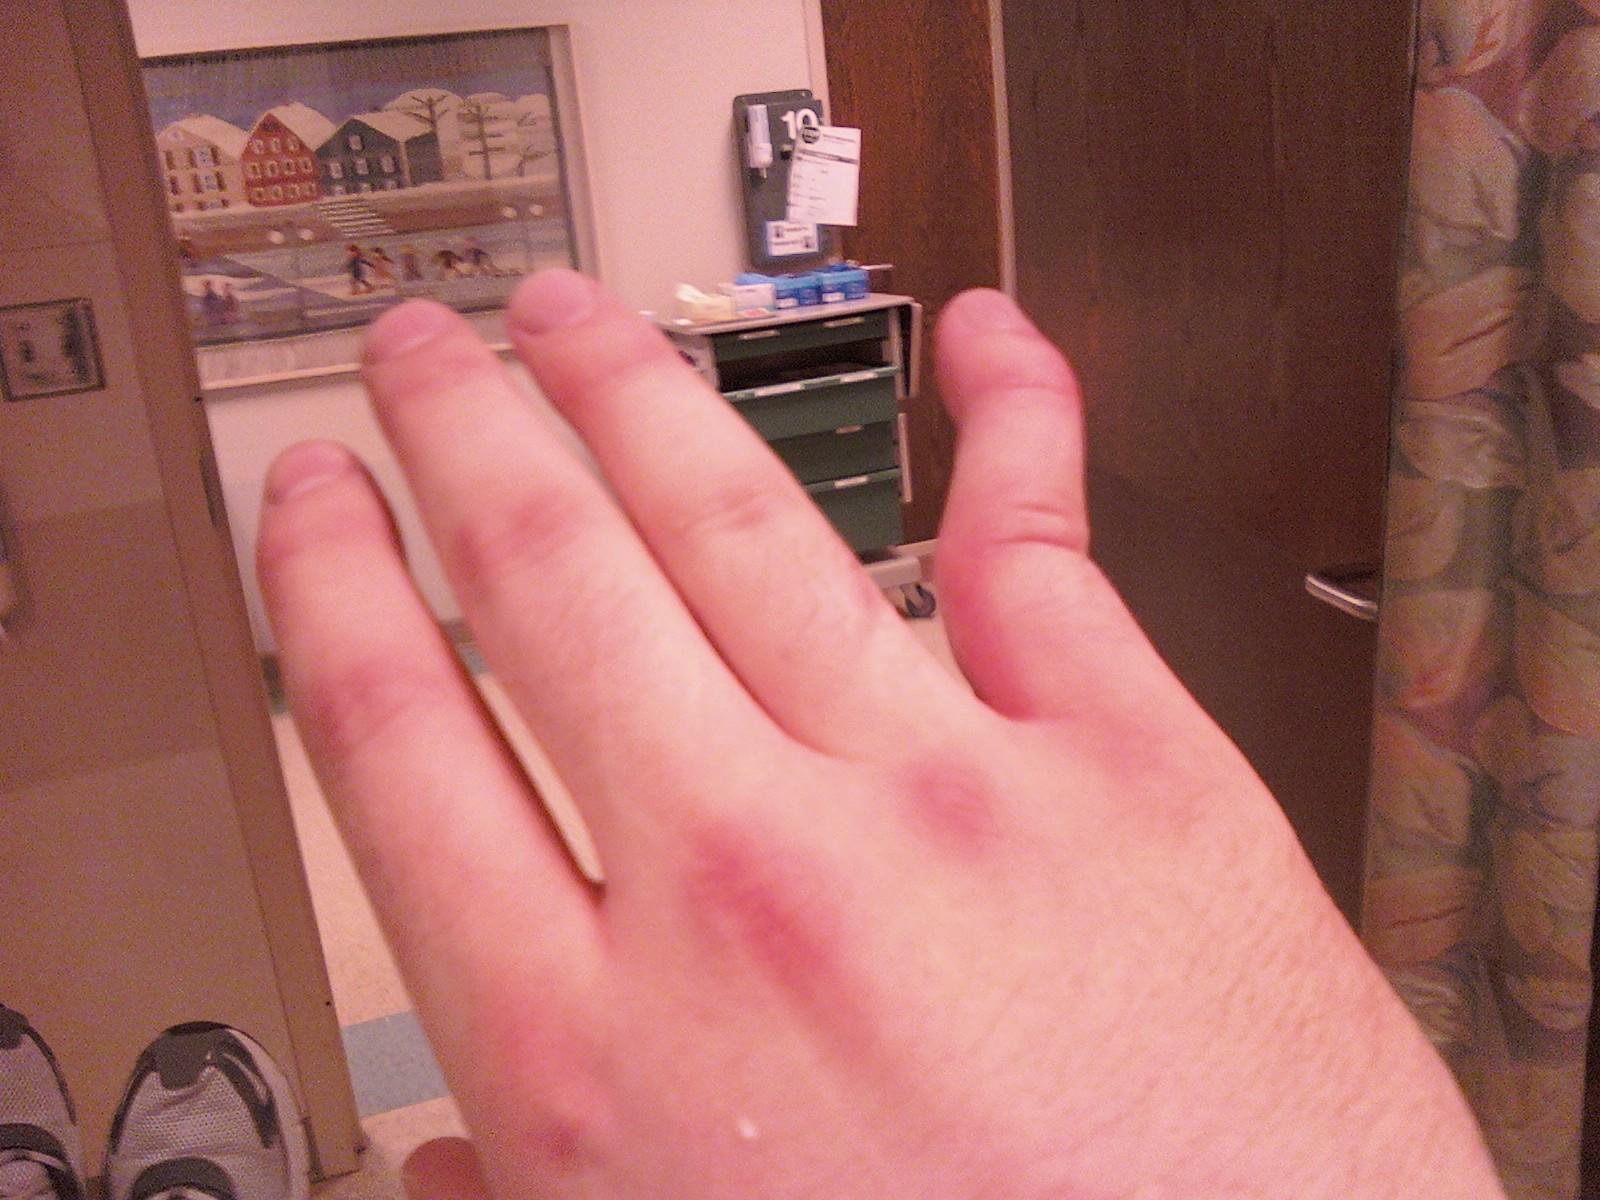 dislocated, broken pinky finger